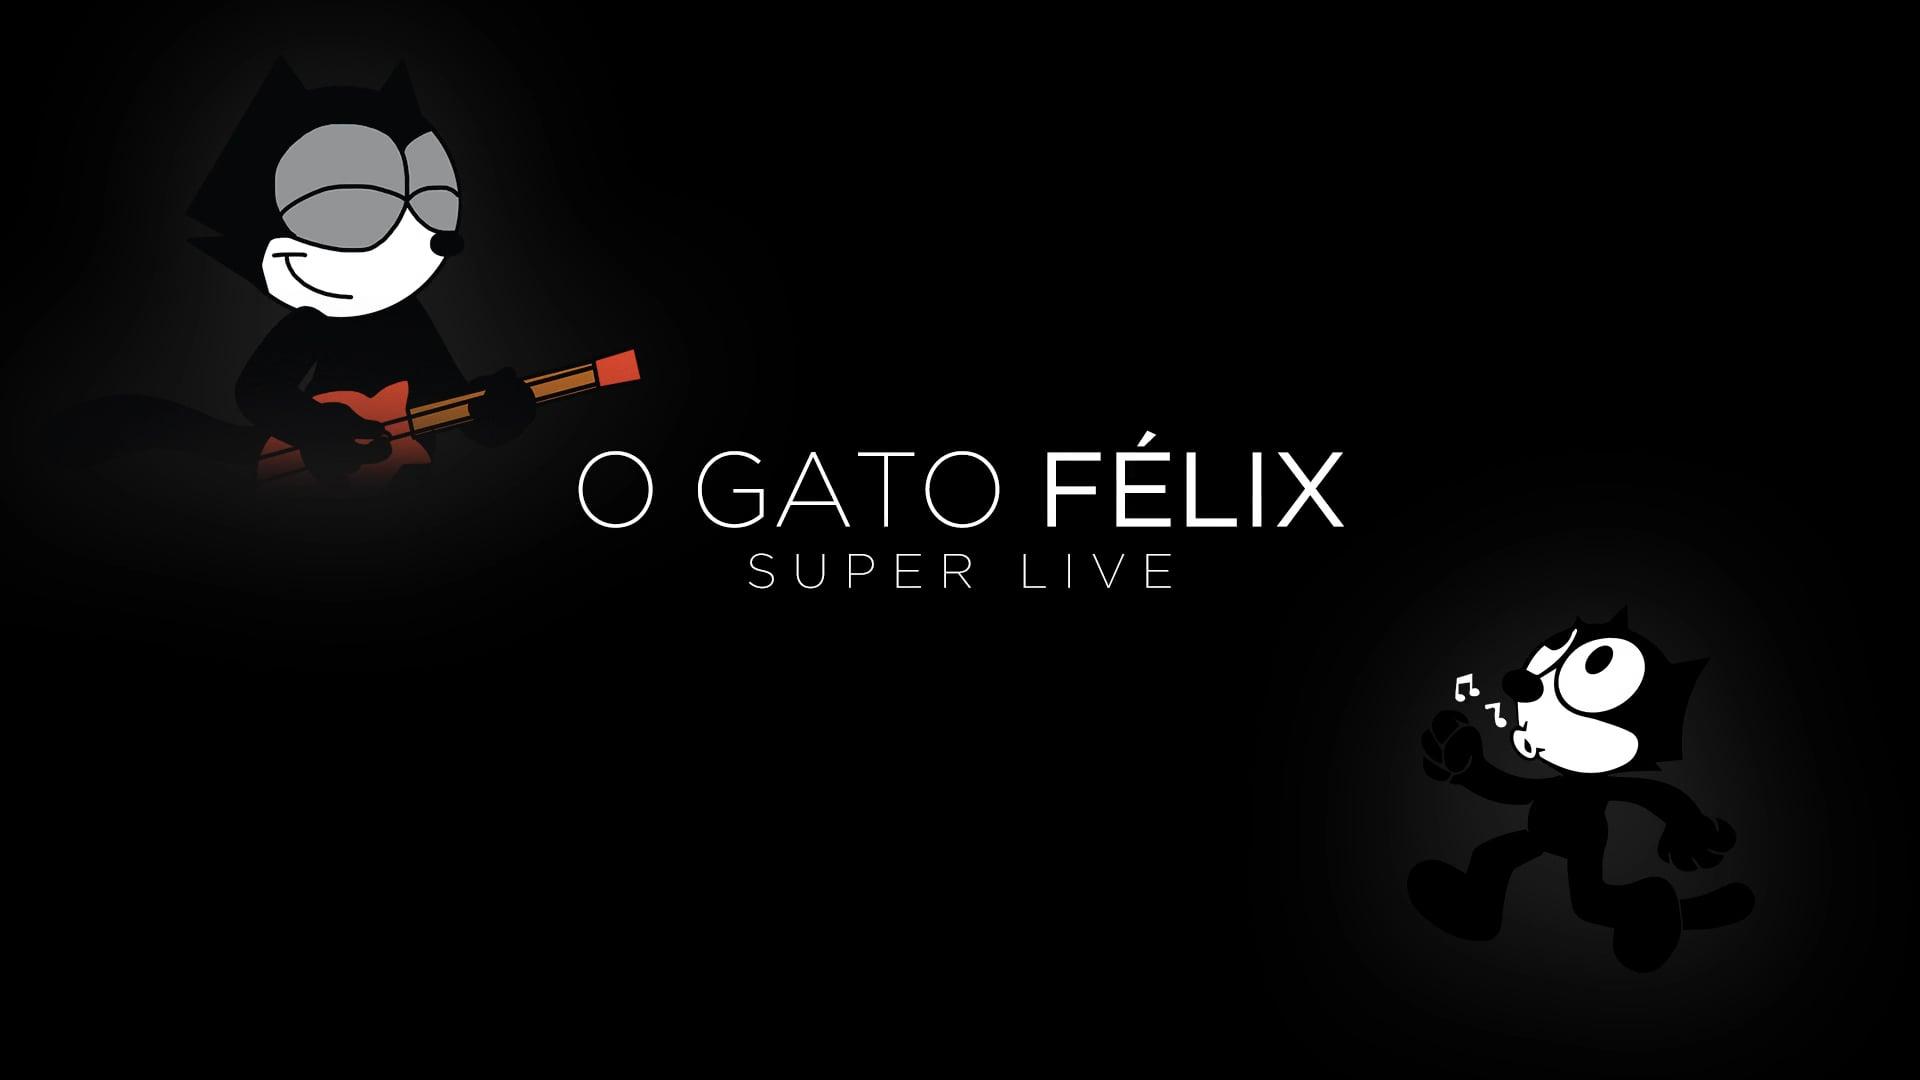 Gato Felix SUPER LIVE CINEMA_Teaser